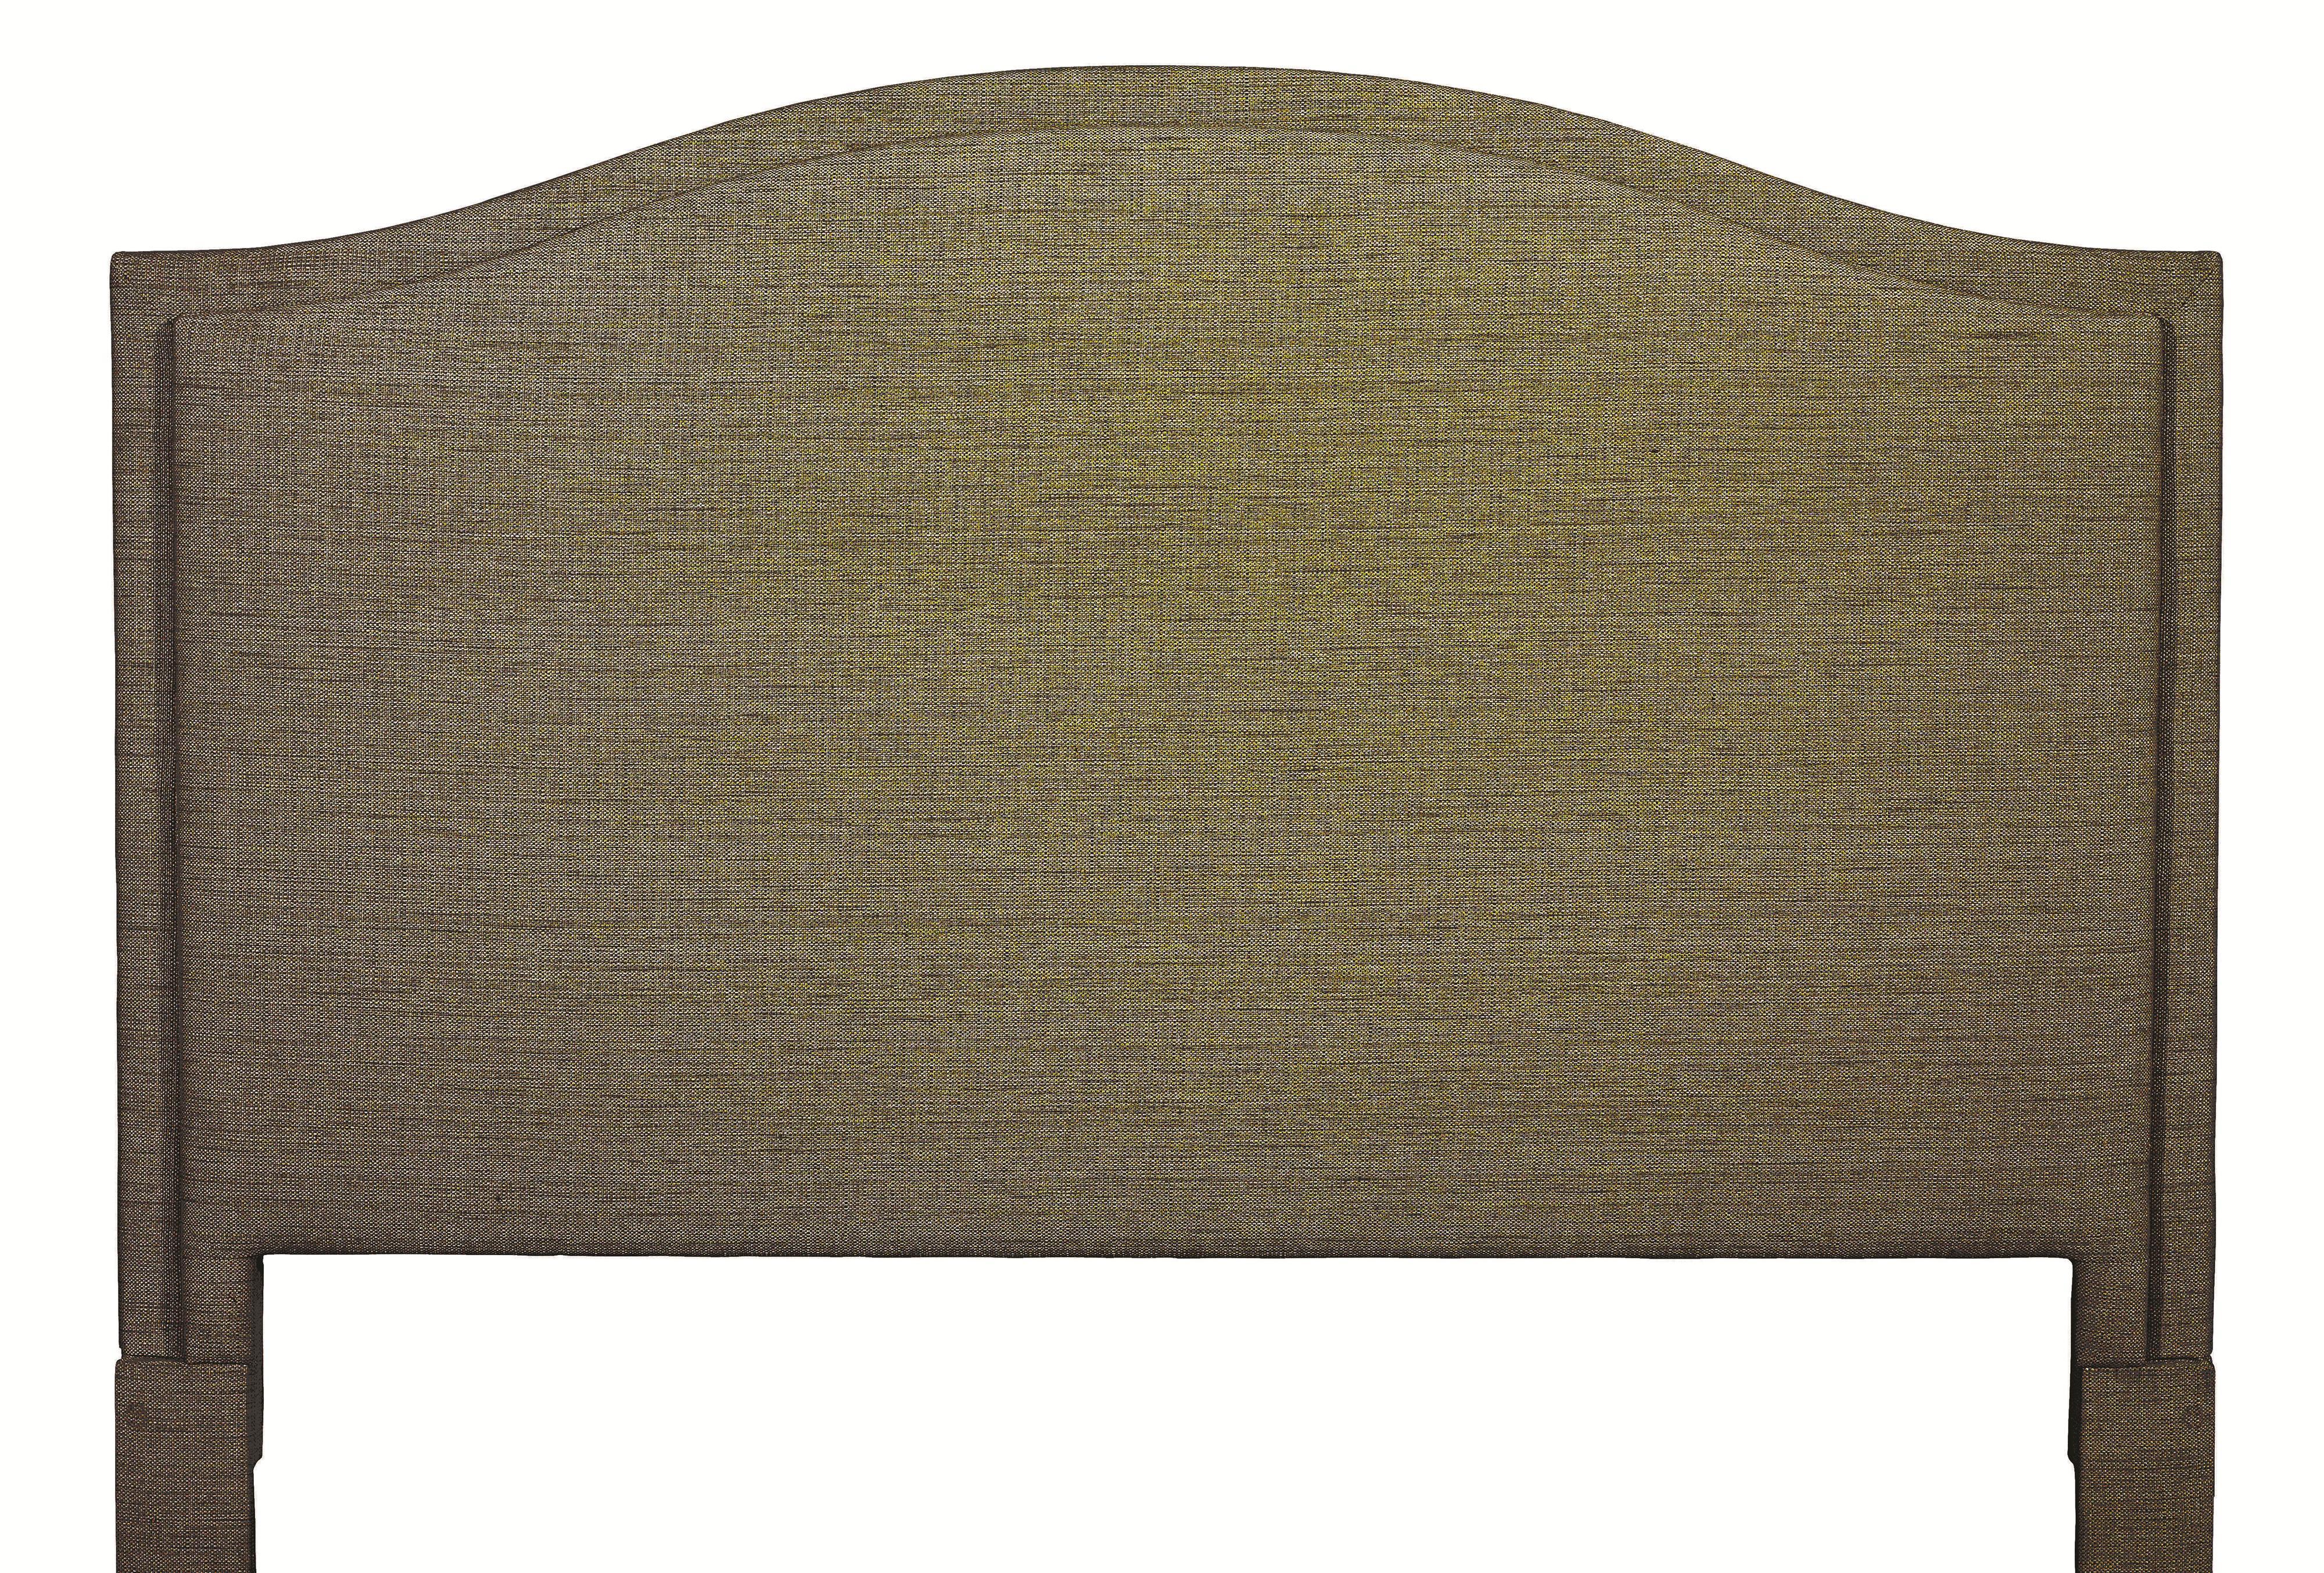 Bassett custom upholstered beds king vienna upholstered headboard dunk bright furniture - Custom headboard ...